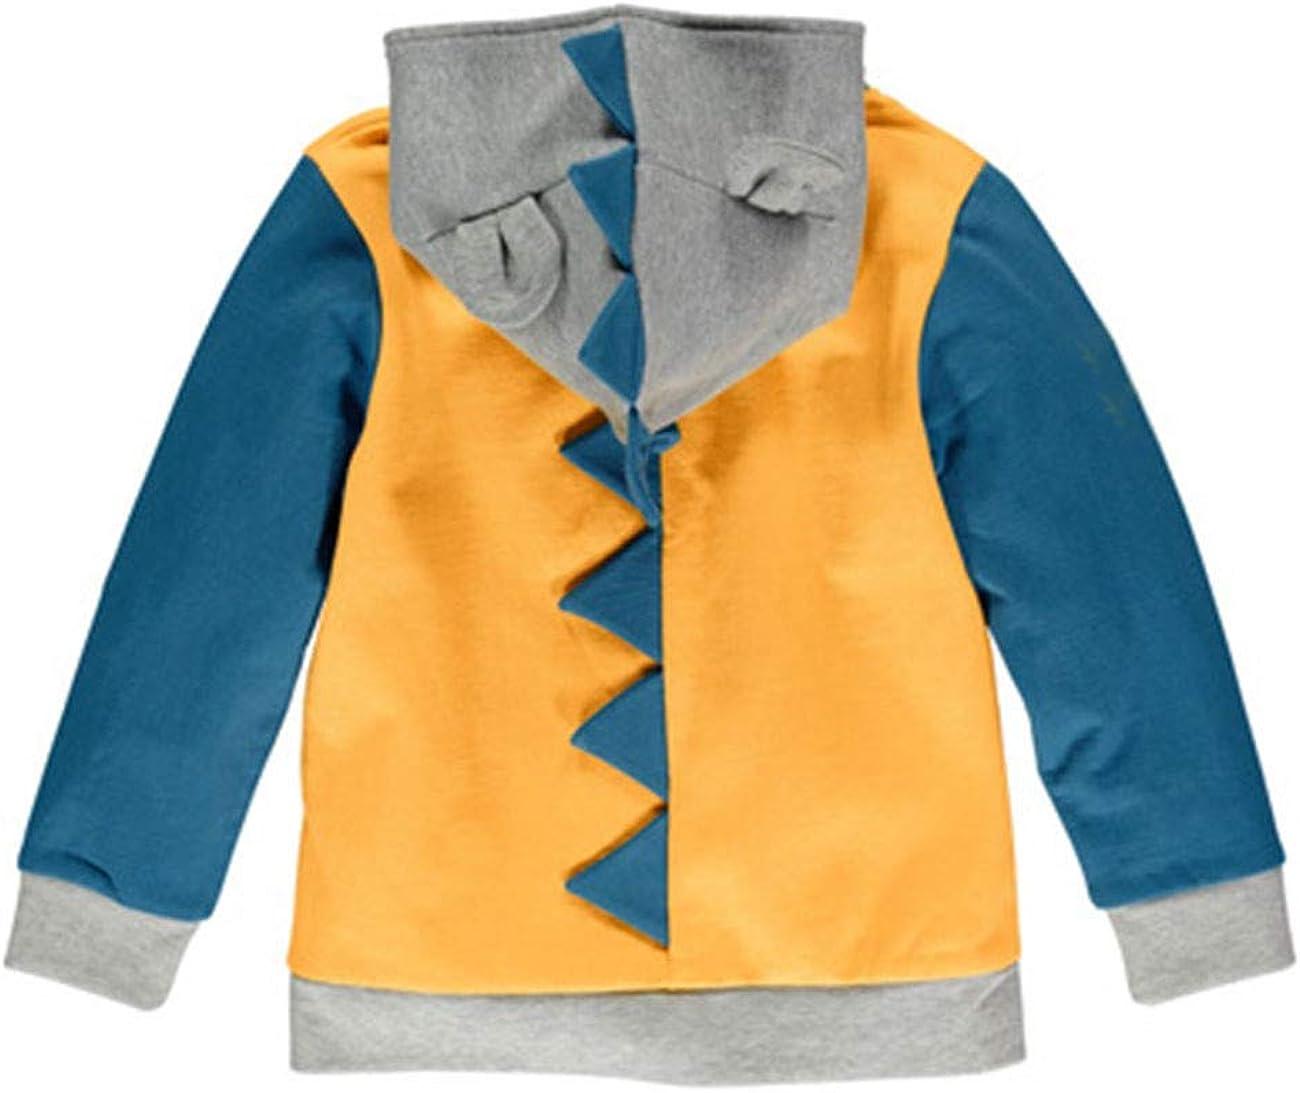 LitBud Toddler Boys Jacket Cartoon Dinosaur Animal Zipper Packaway Spring Autumn Hoodies Coat for Kids 1-7 Years